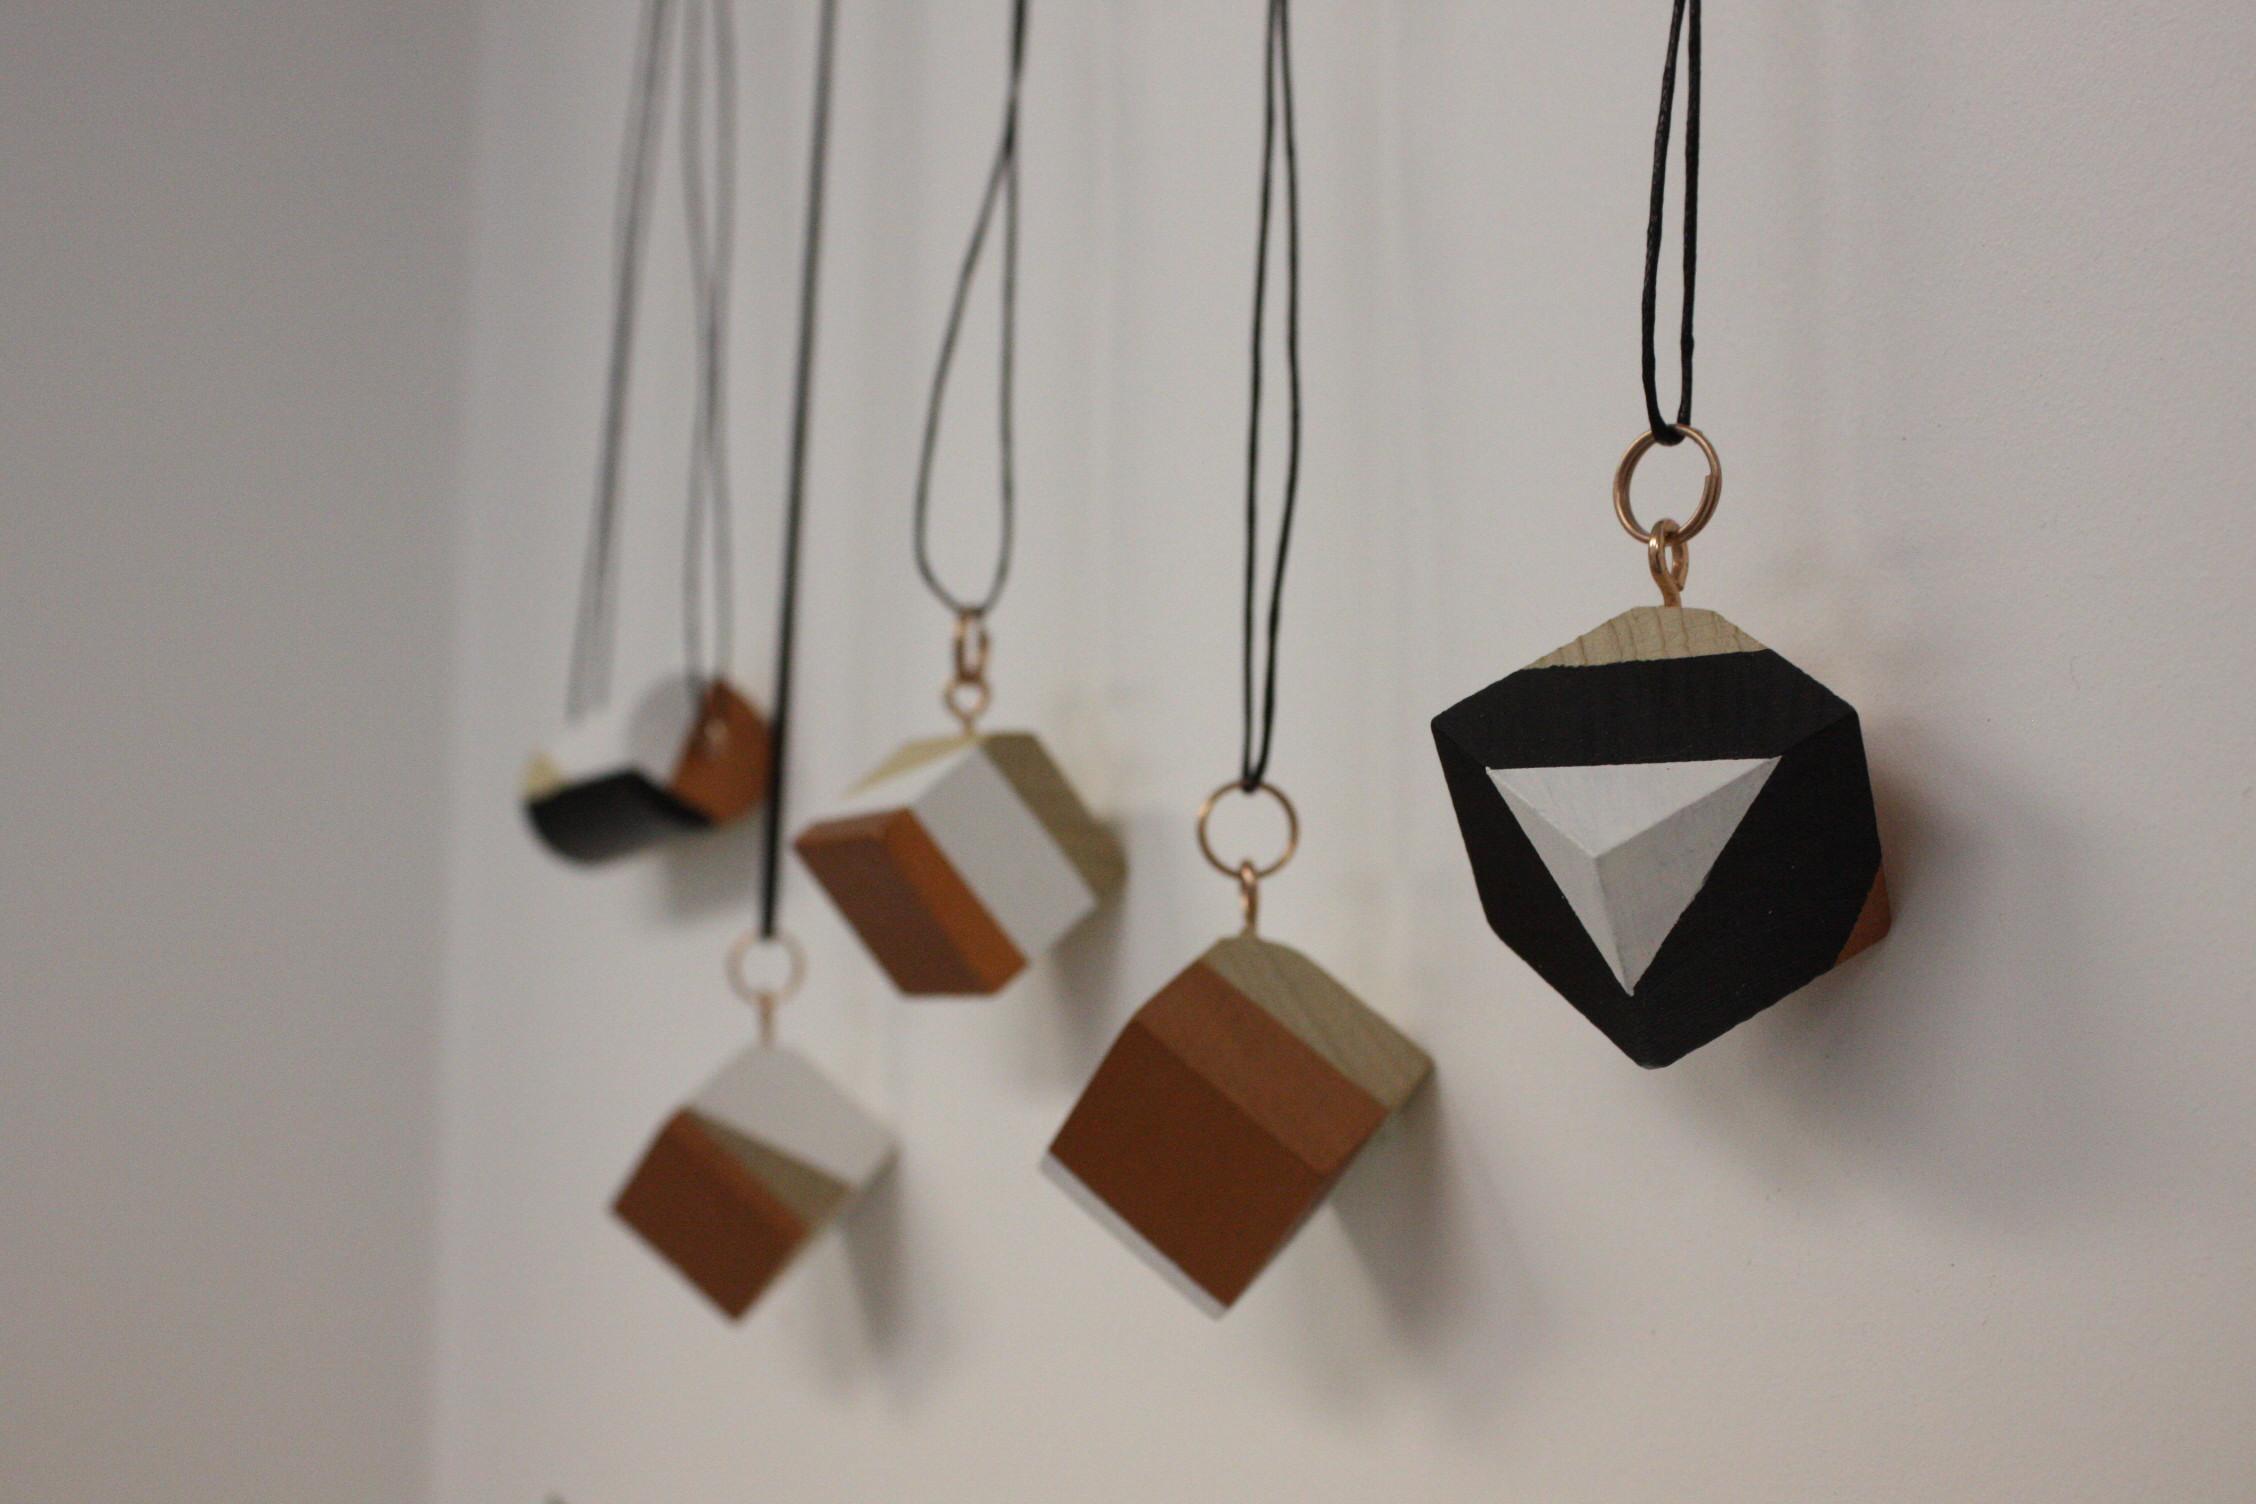 3Handmade_Jewellery_Collaboration_LaurenTaylor&EmmaCrabtree.jpg